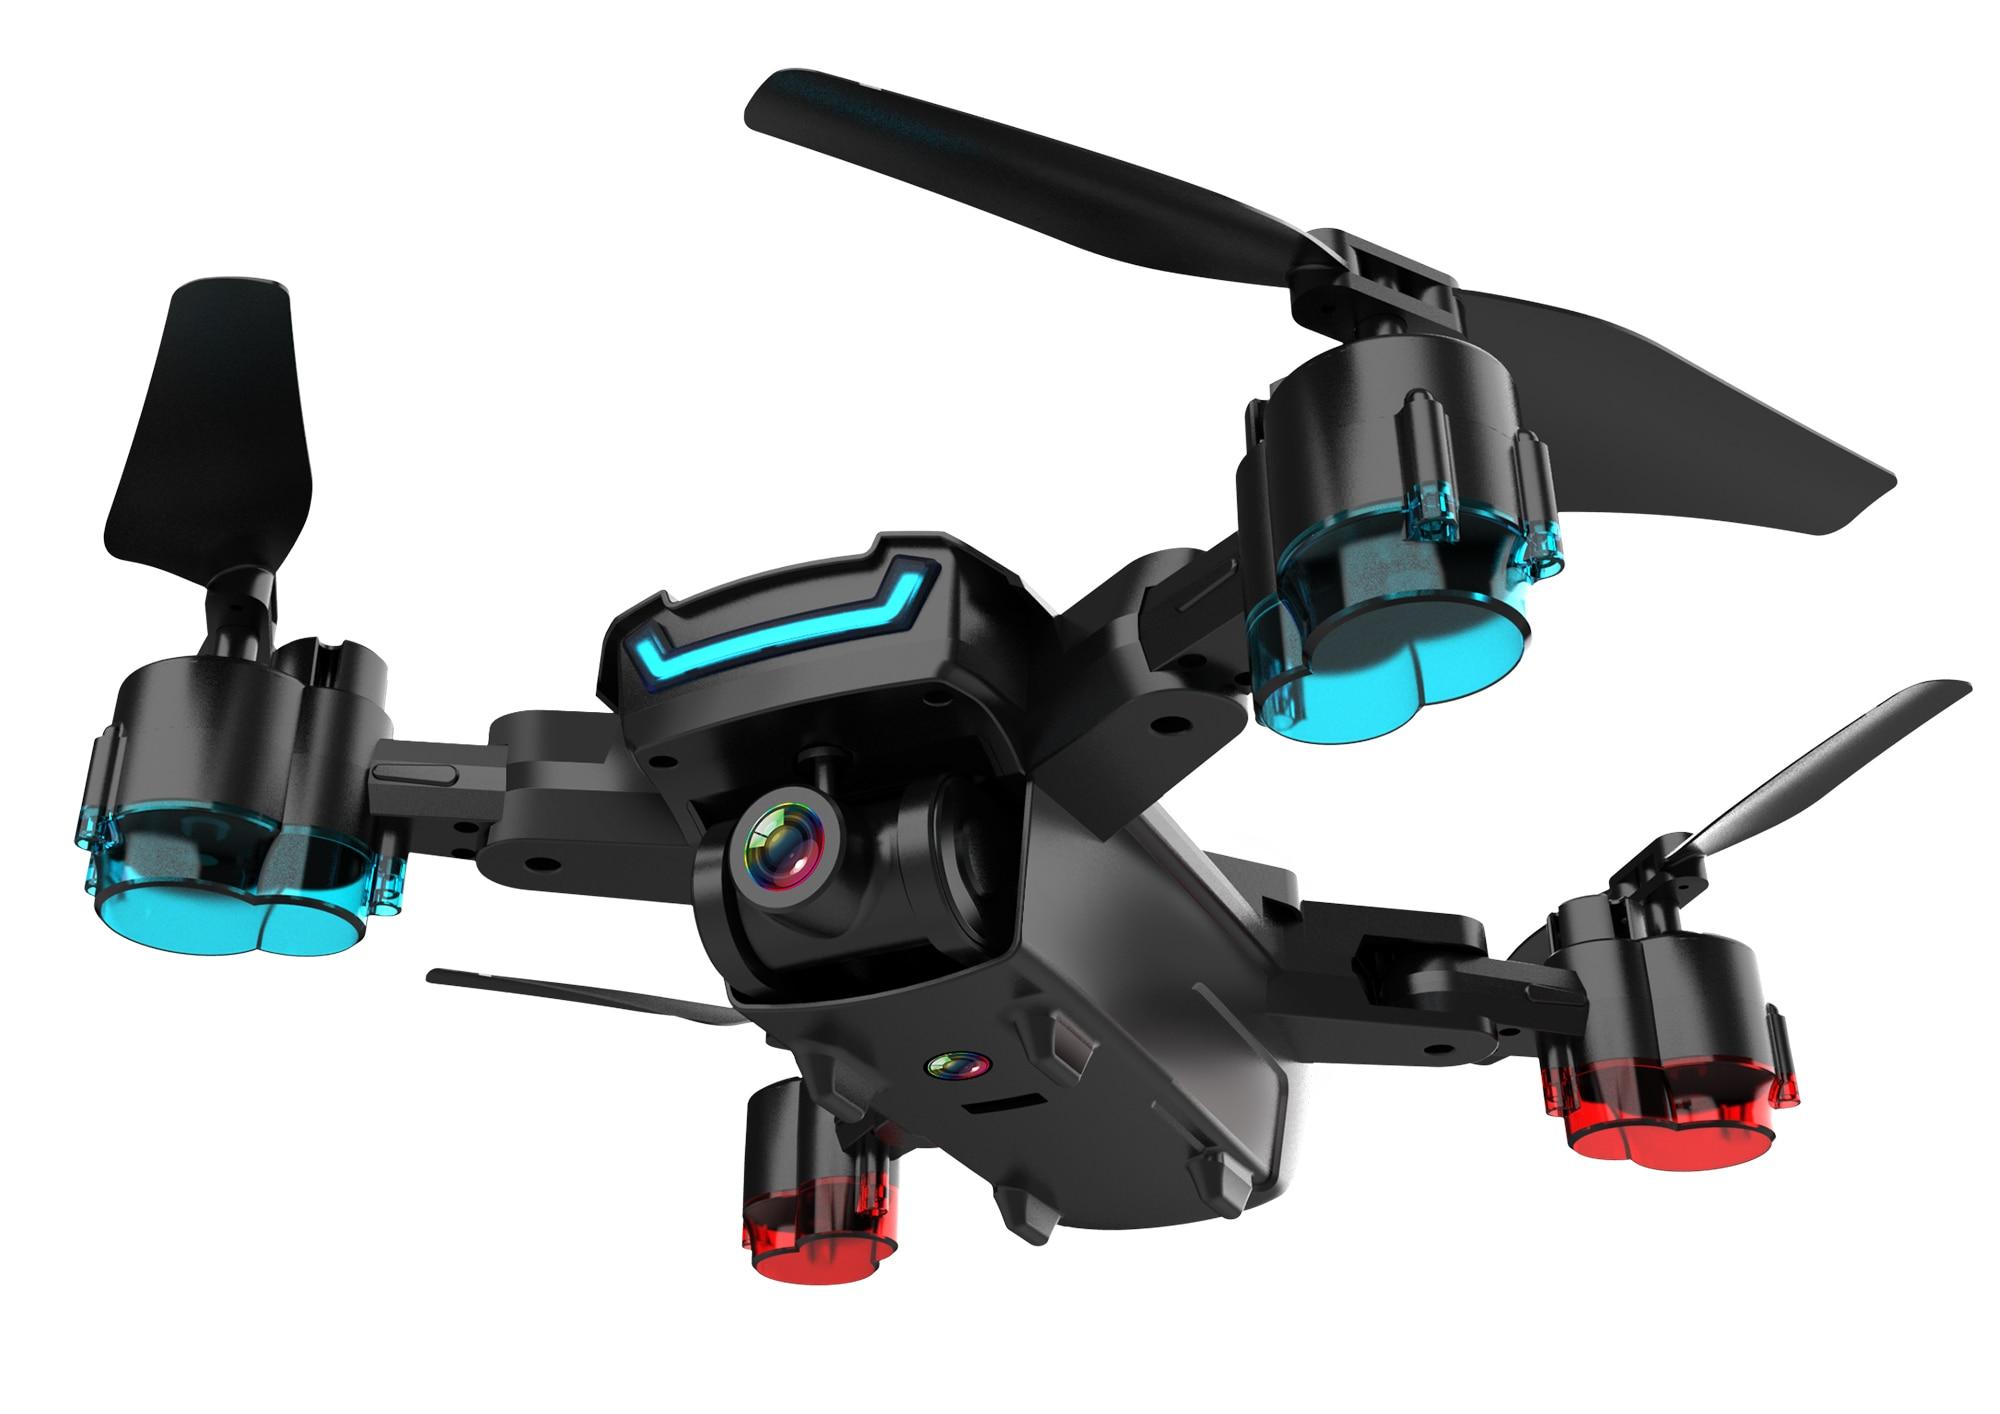 K2 Drone 4k HD caméra drone 1080P WIFI FPV drone vidéo quadrirotor en direct altitude garder drone avec caméra RC hélicoptère dron jouet drone camera drones mini drone profissional fpv toys - 5